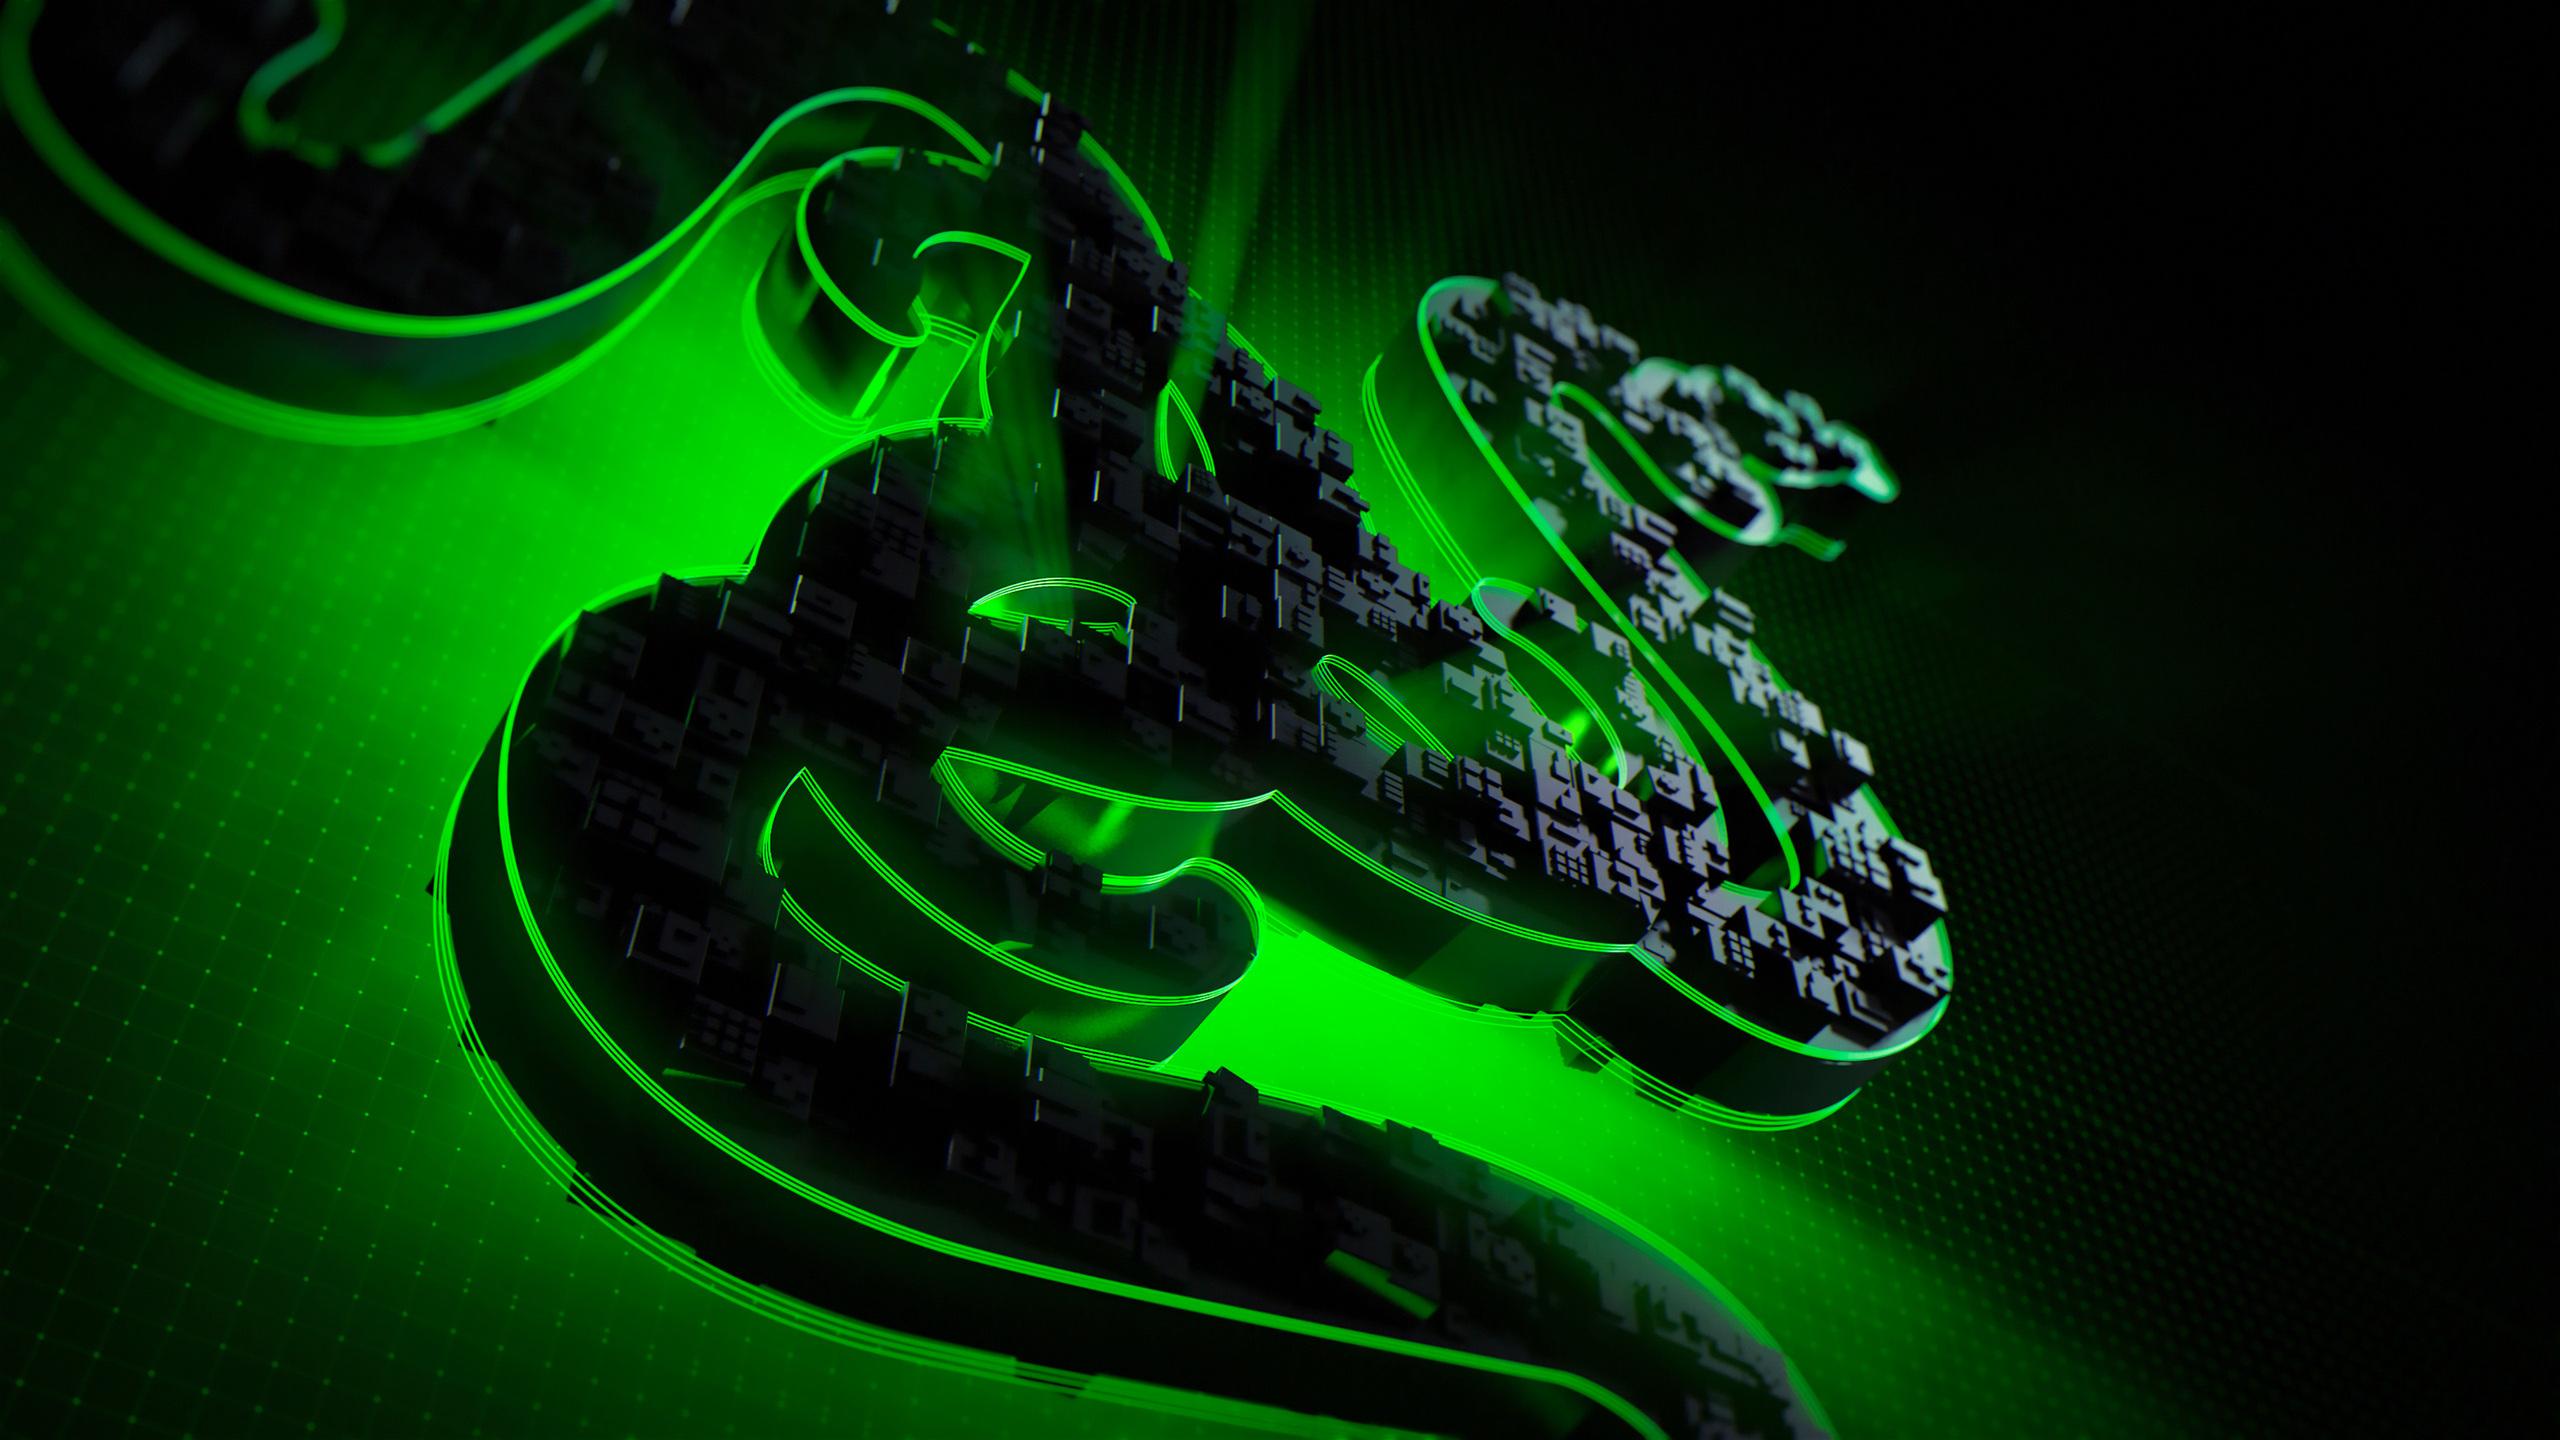 2560x1440 Razer Logo 4k 1440P Resolution HD 4k Wallpapers ...